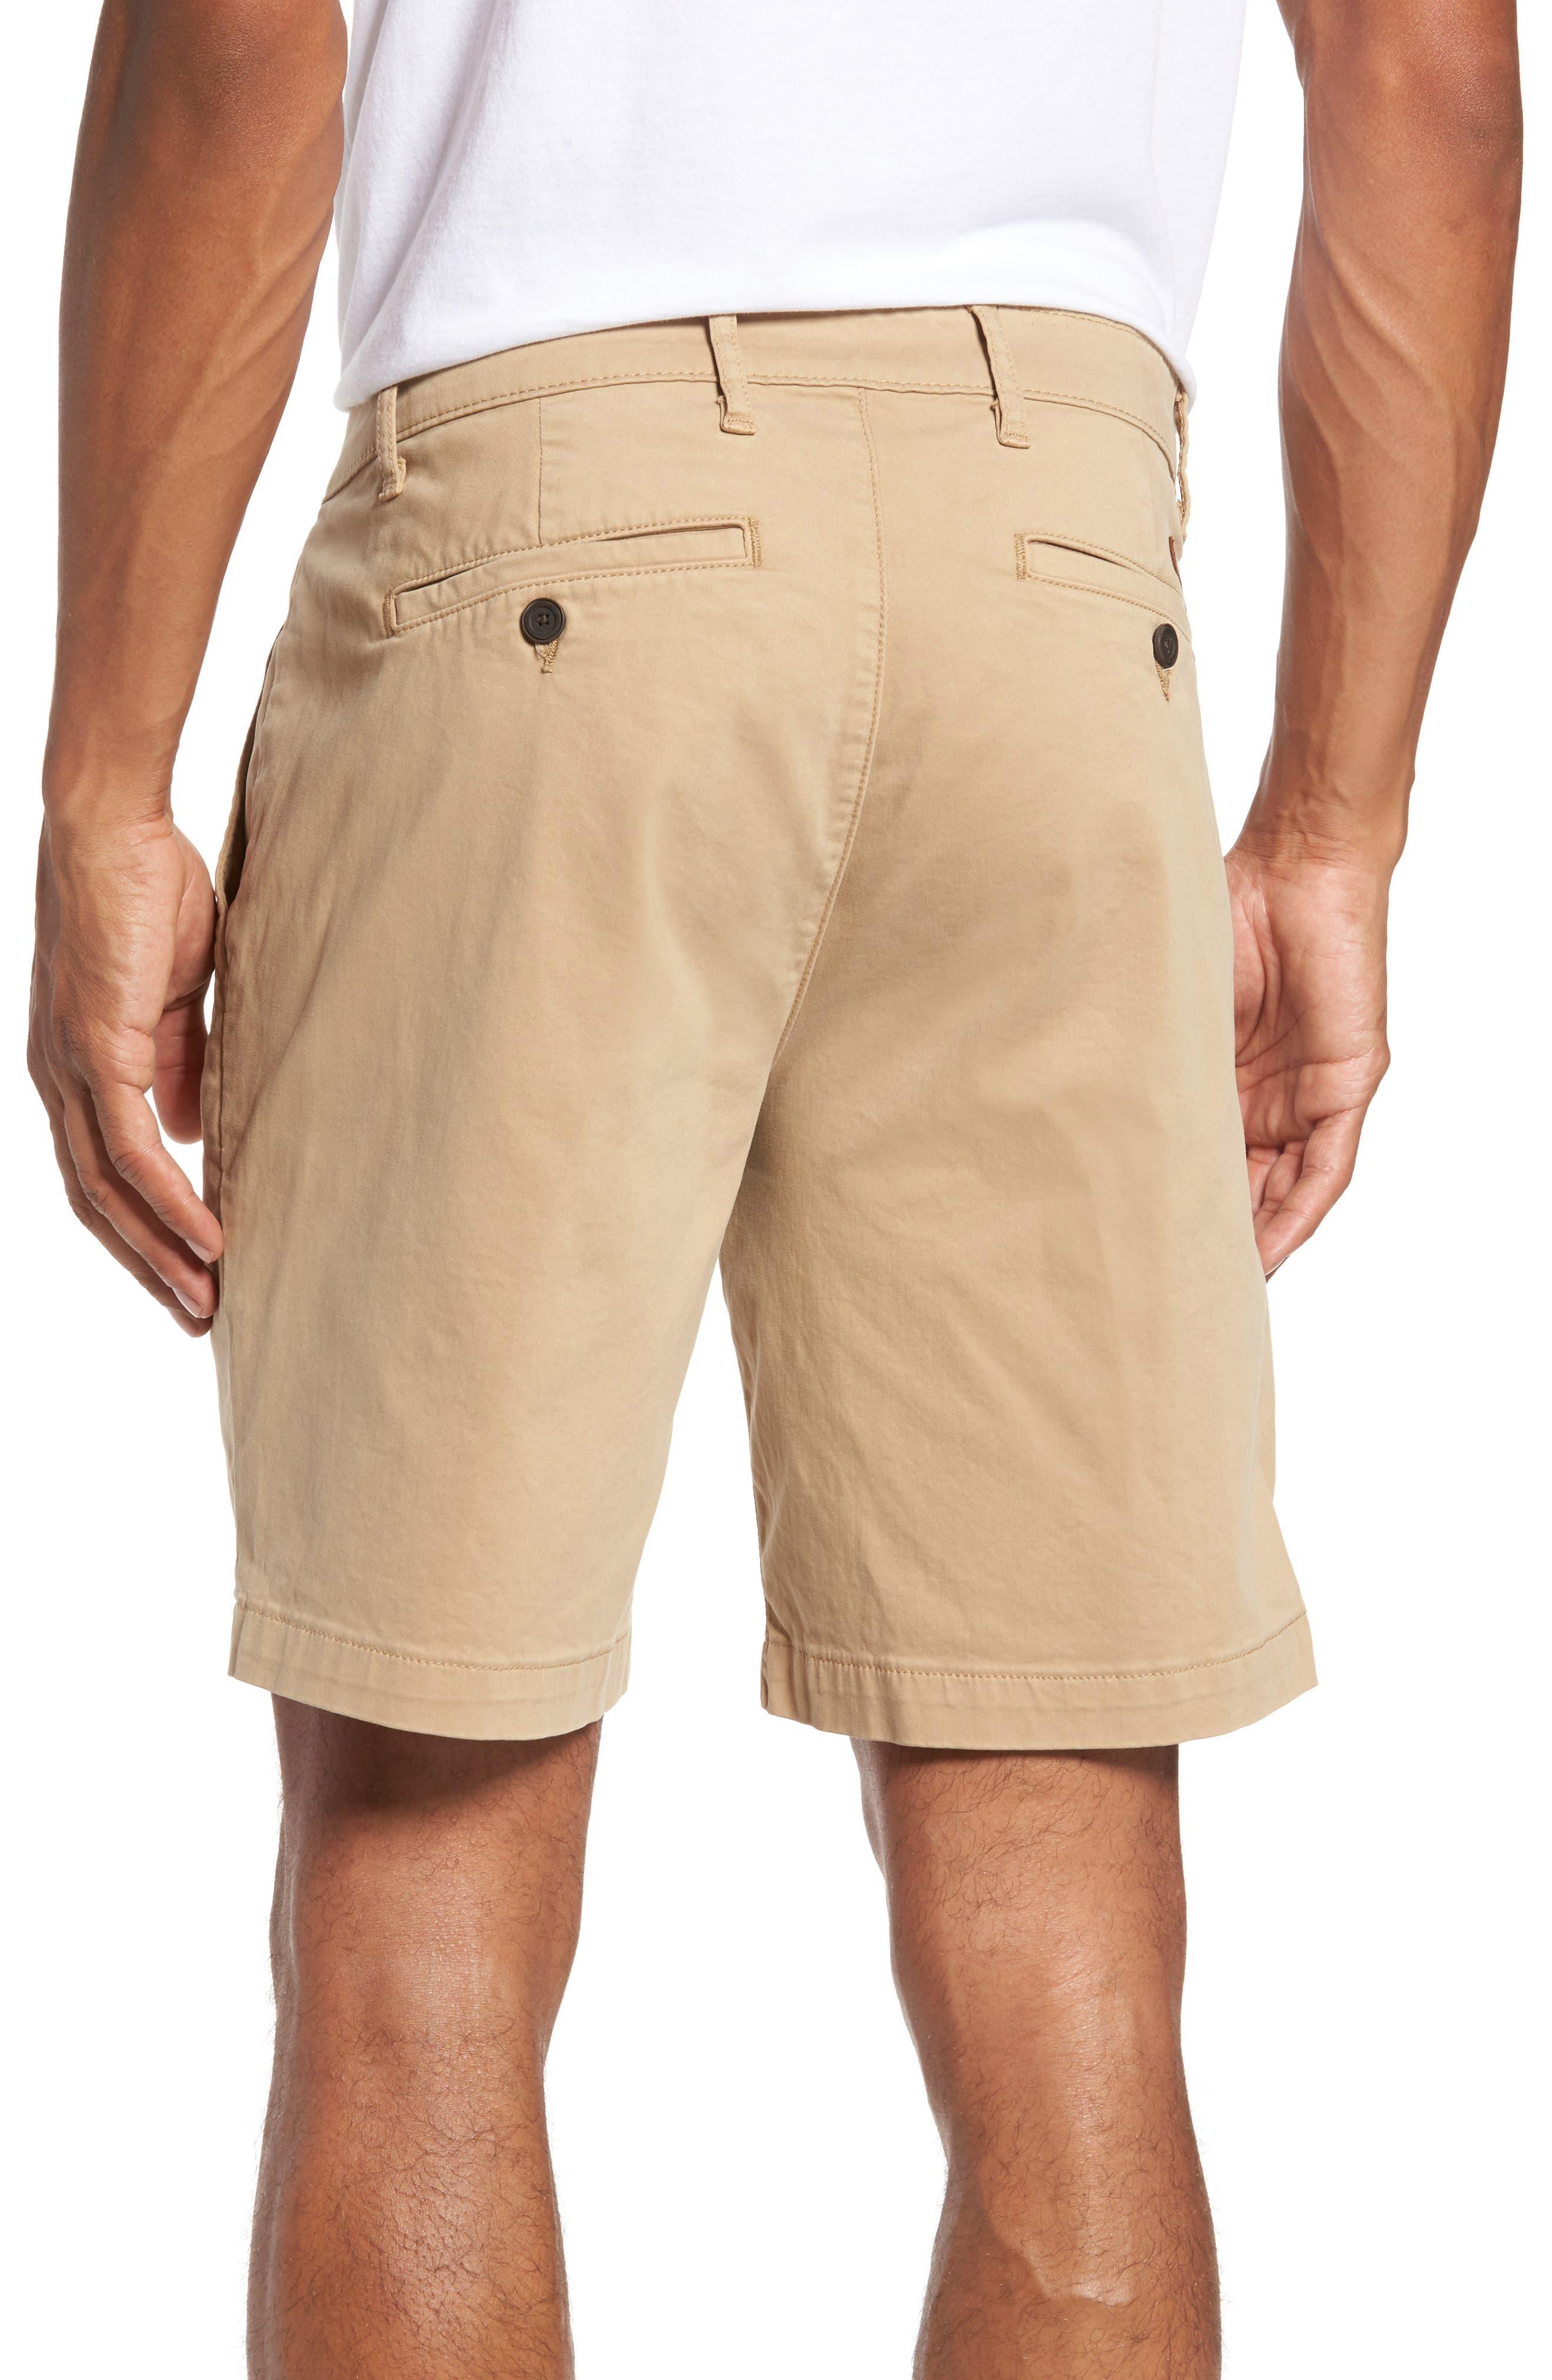 Wanderer Modern Slim Fit Shorts,                             Alternate thumbnail 2, color,                             244